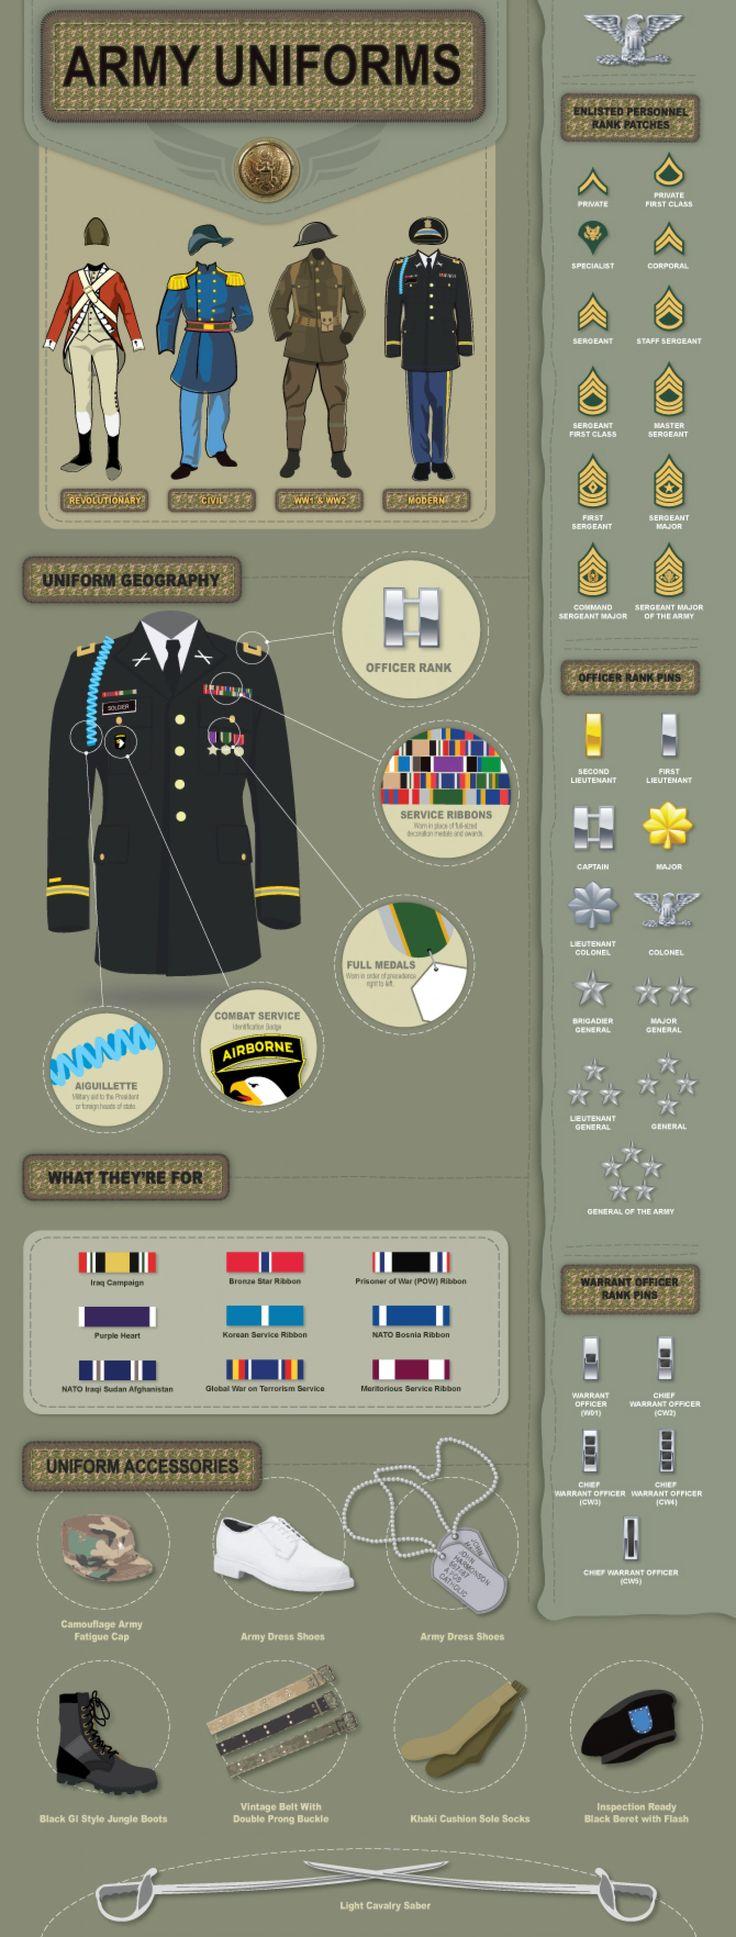 Military Uniform Infographic